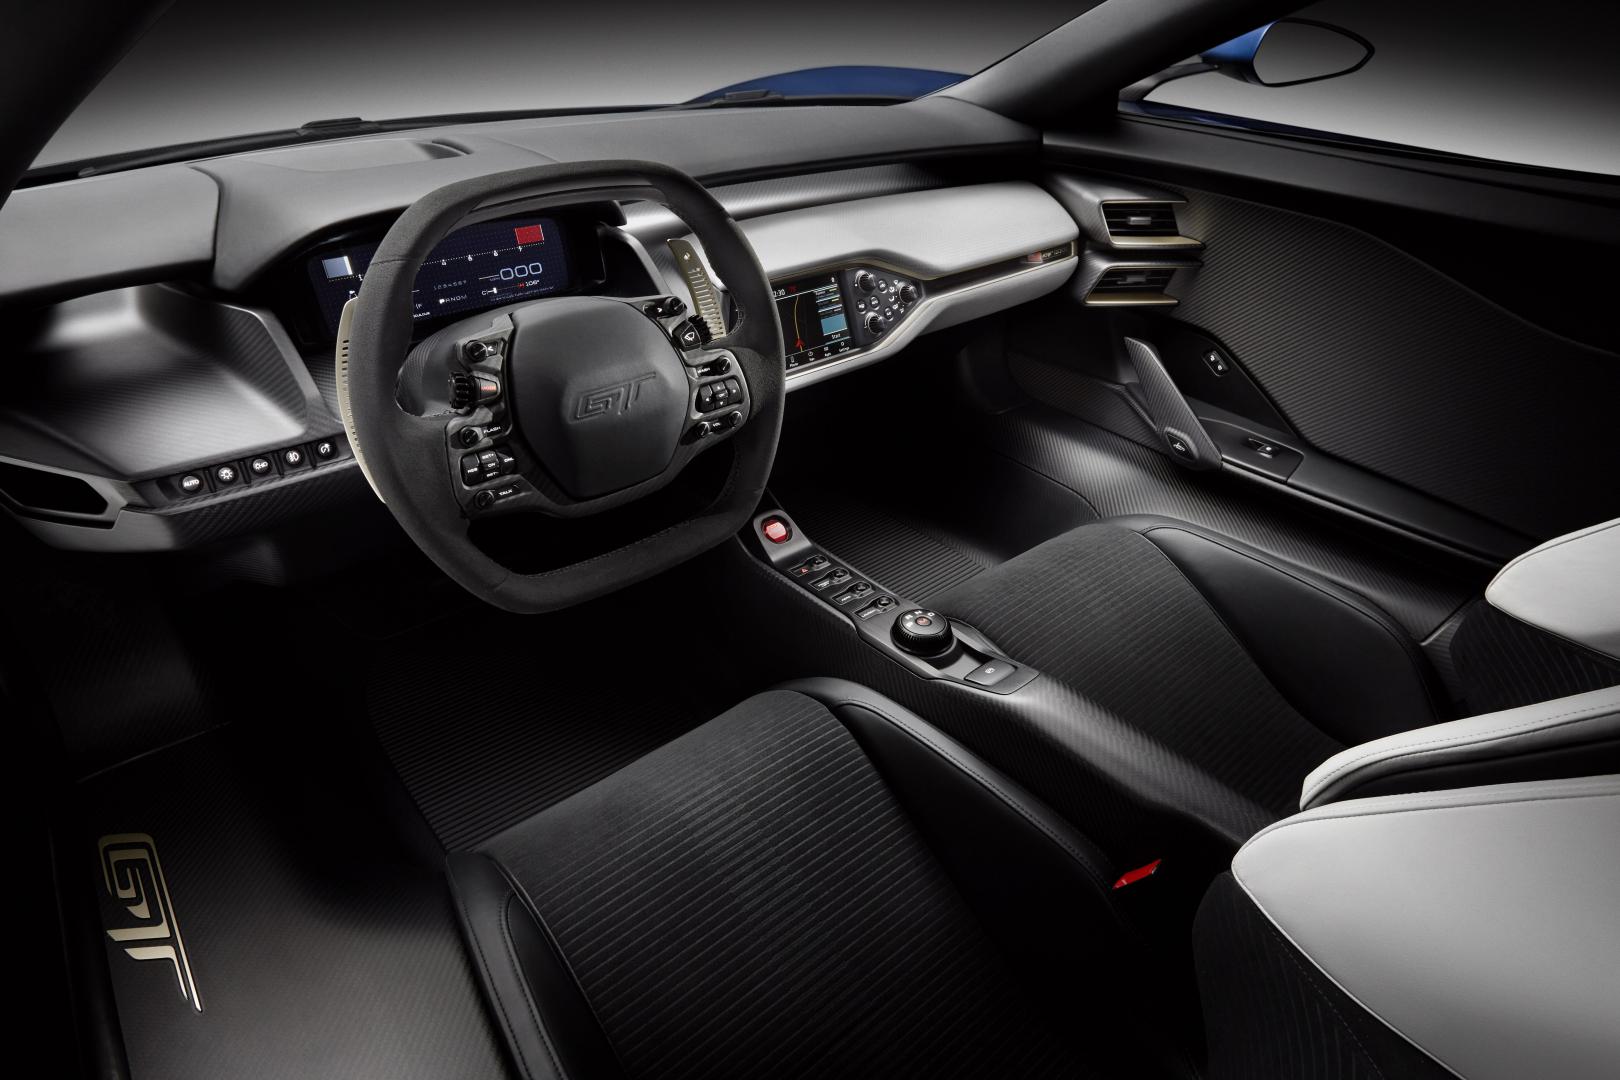 FordSidm2015_GT_002